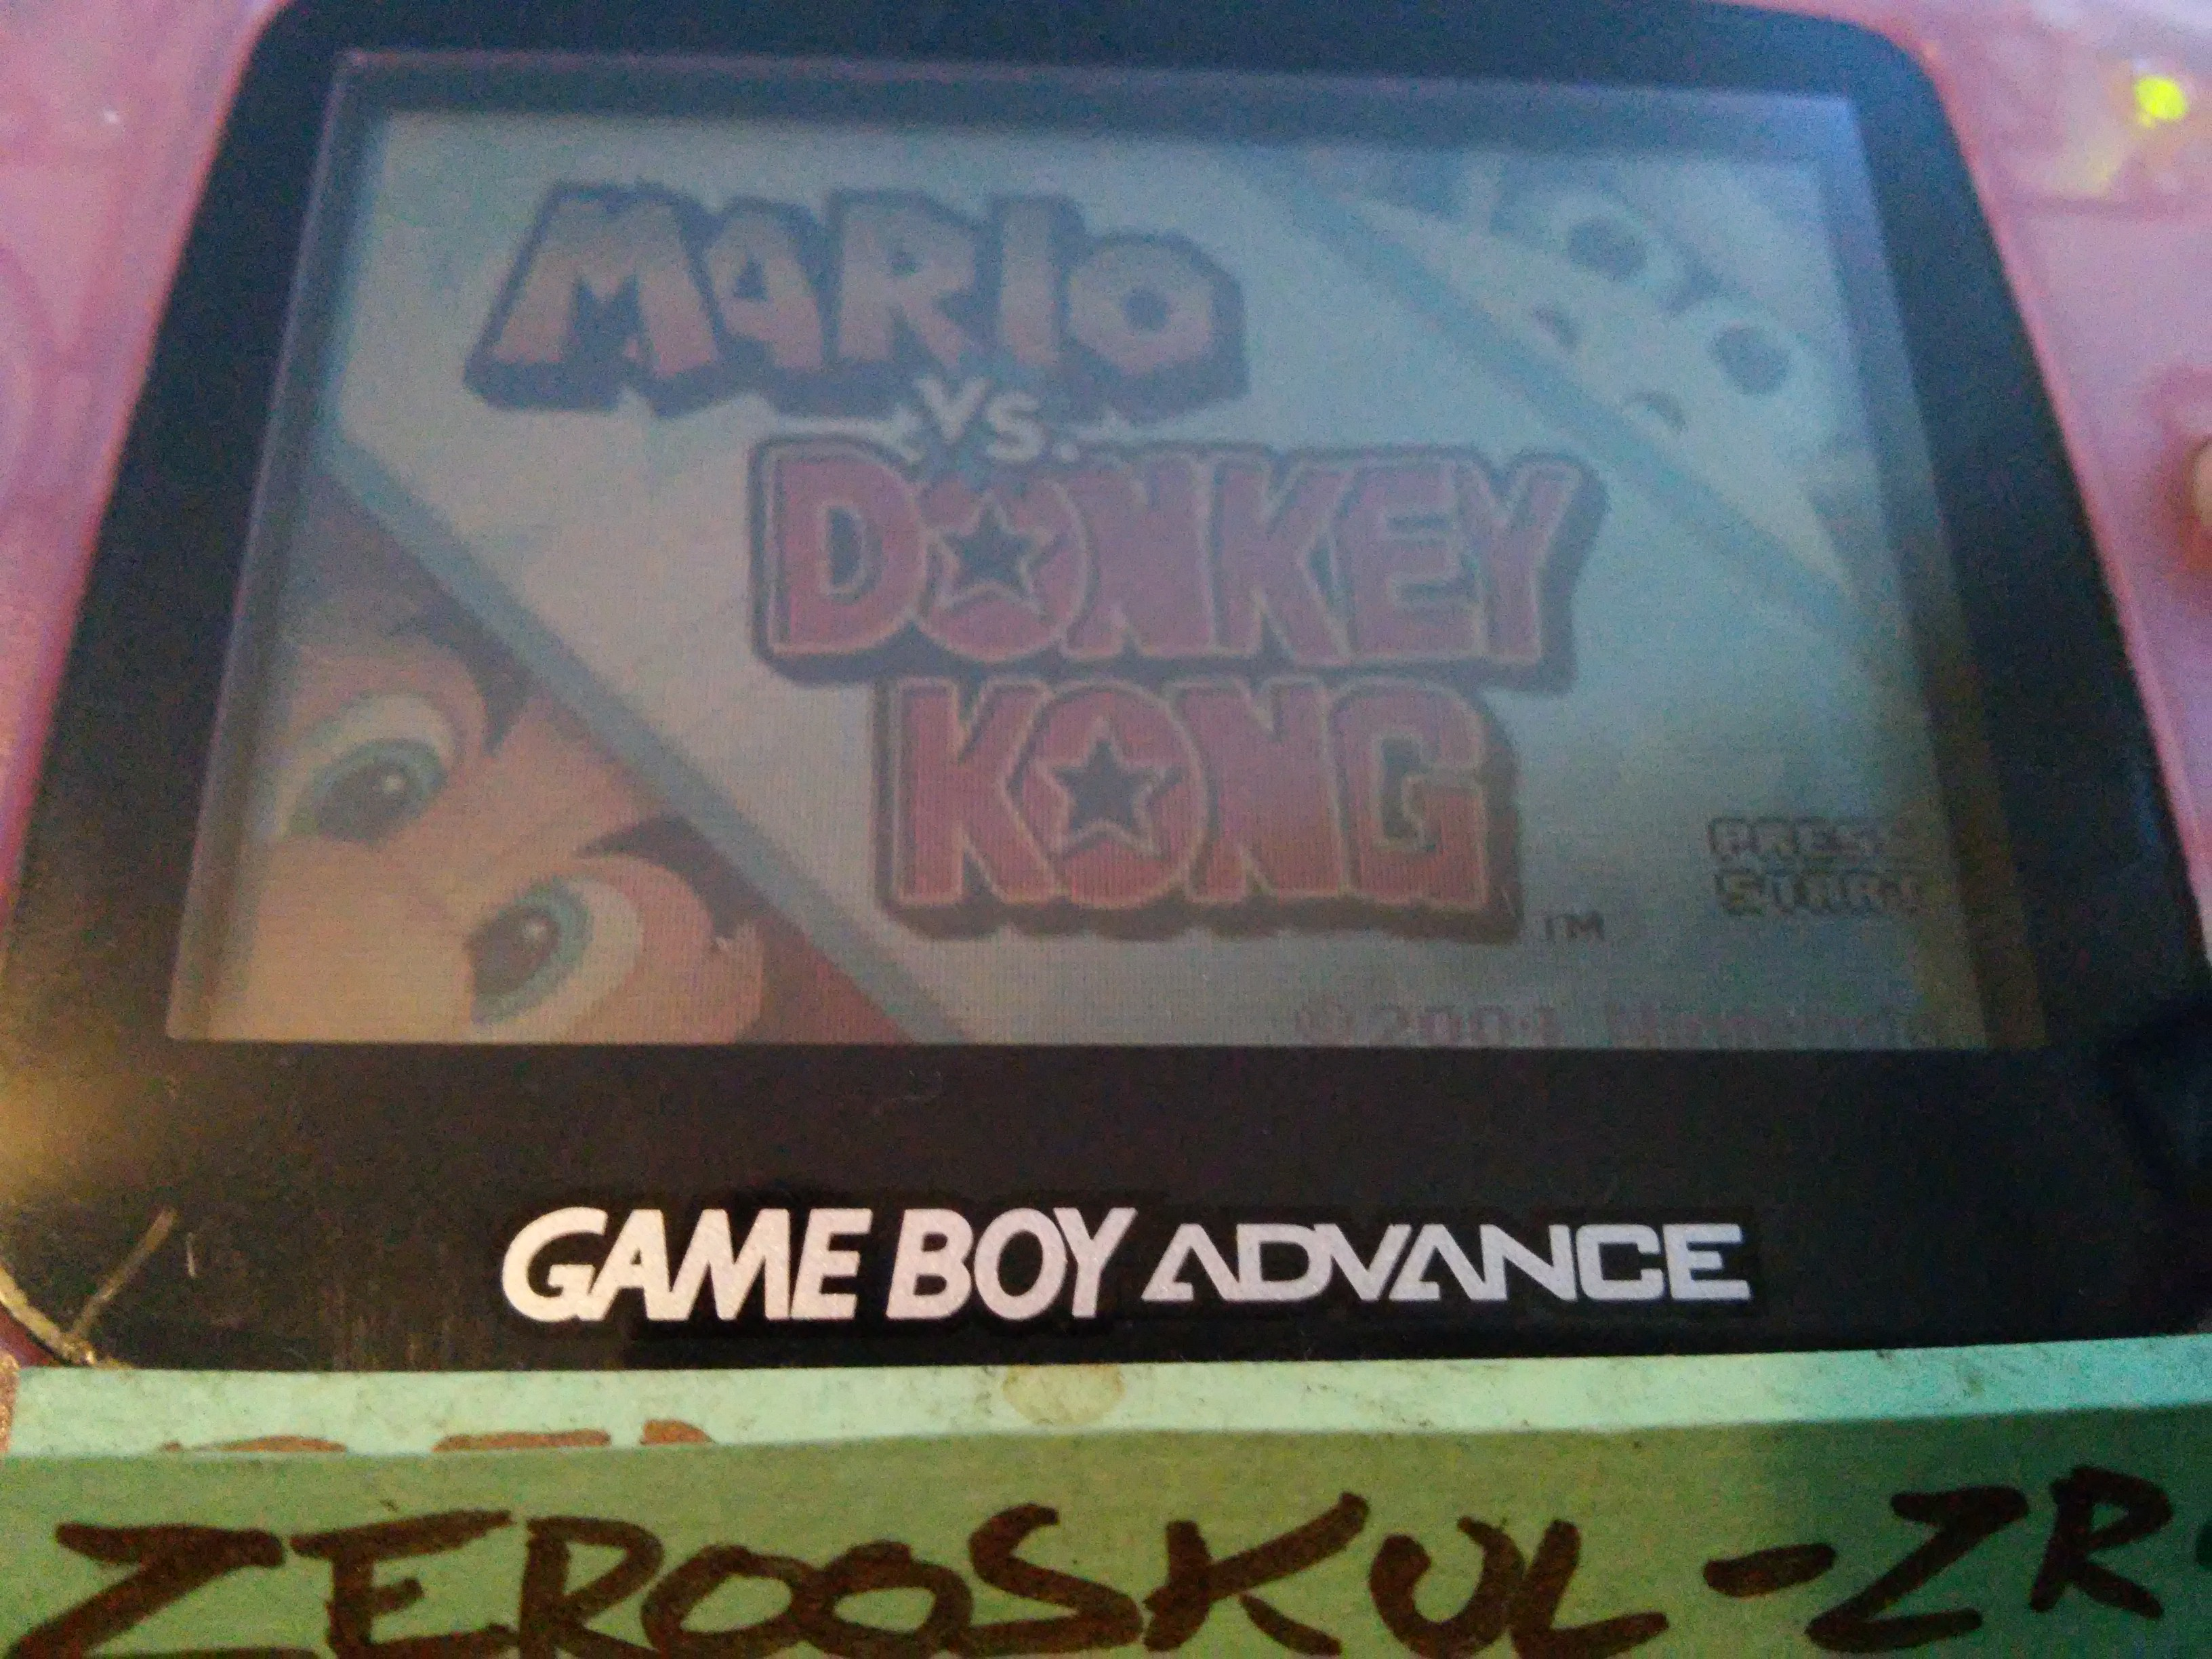 zerooskul: Mario Vs. Donkey Kong: Level 1-5 (GBA) 36,500 points on 2018-09-23 15:25:41